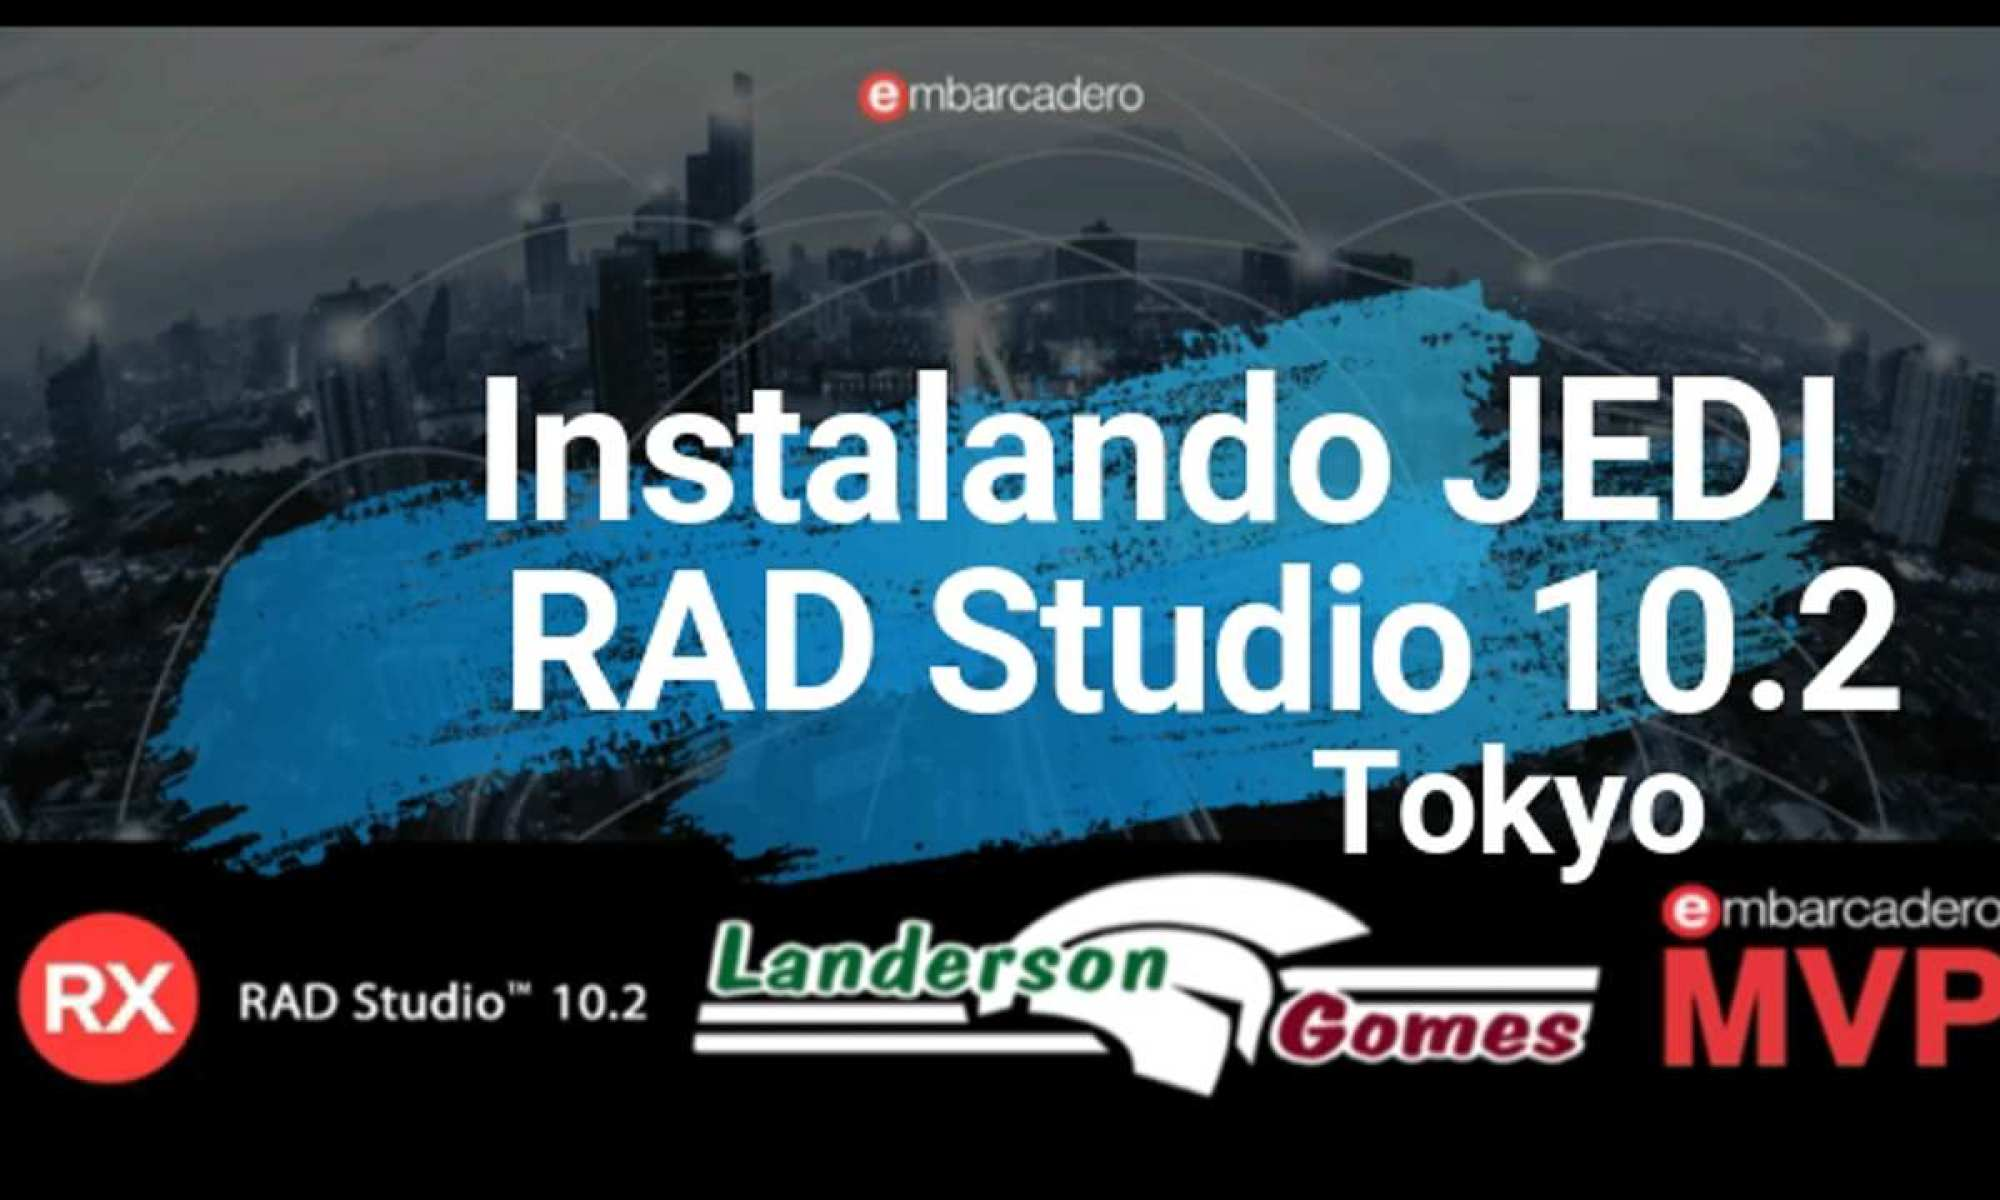 Instalando Componentes JEDI no RAD Studio 10.2